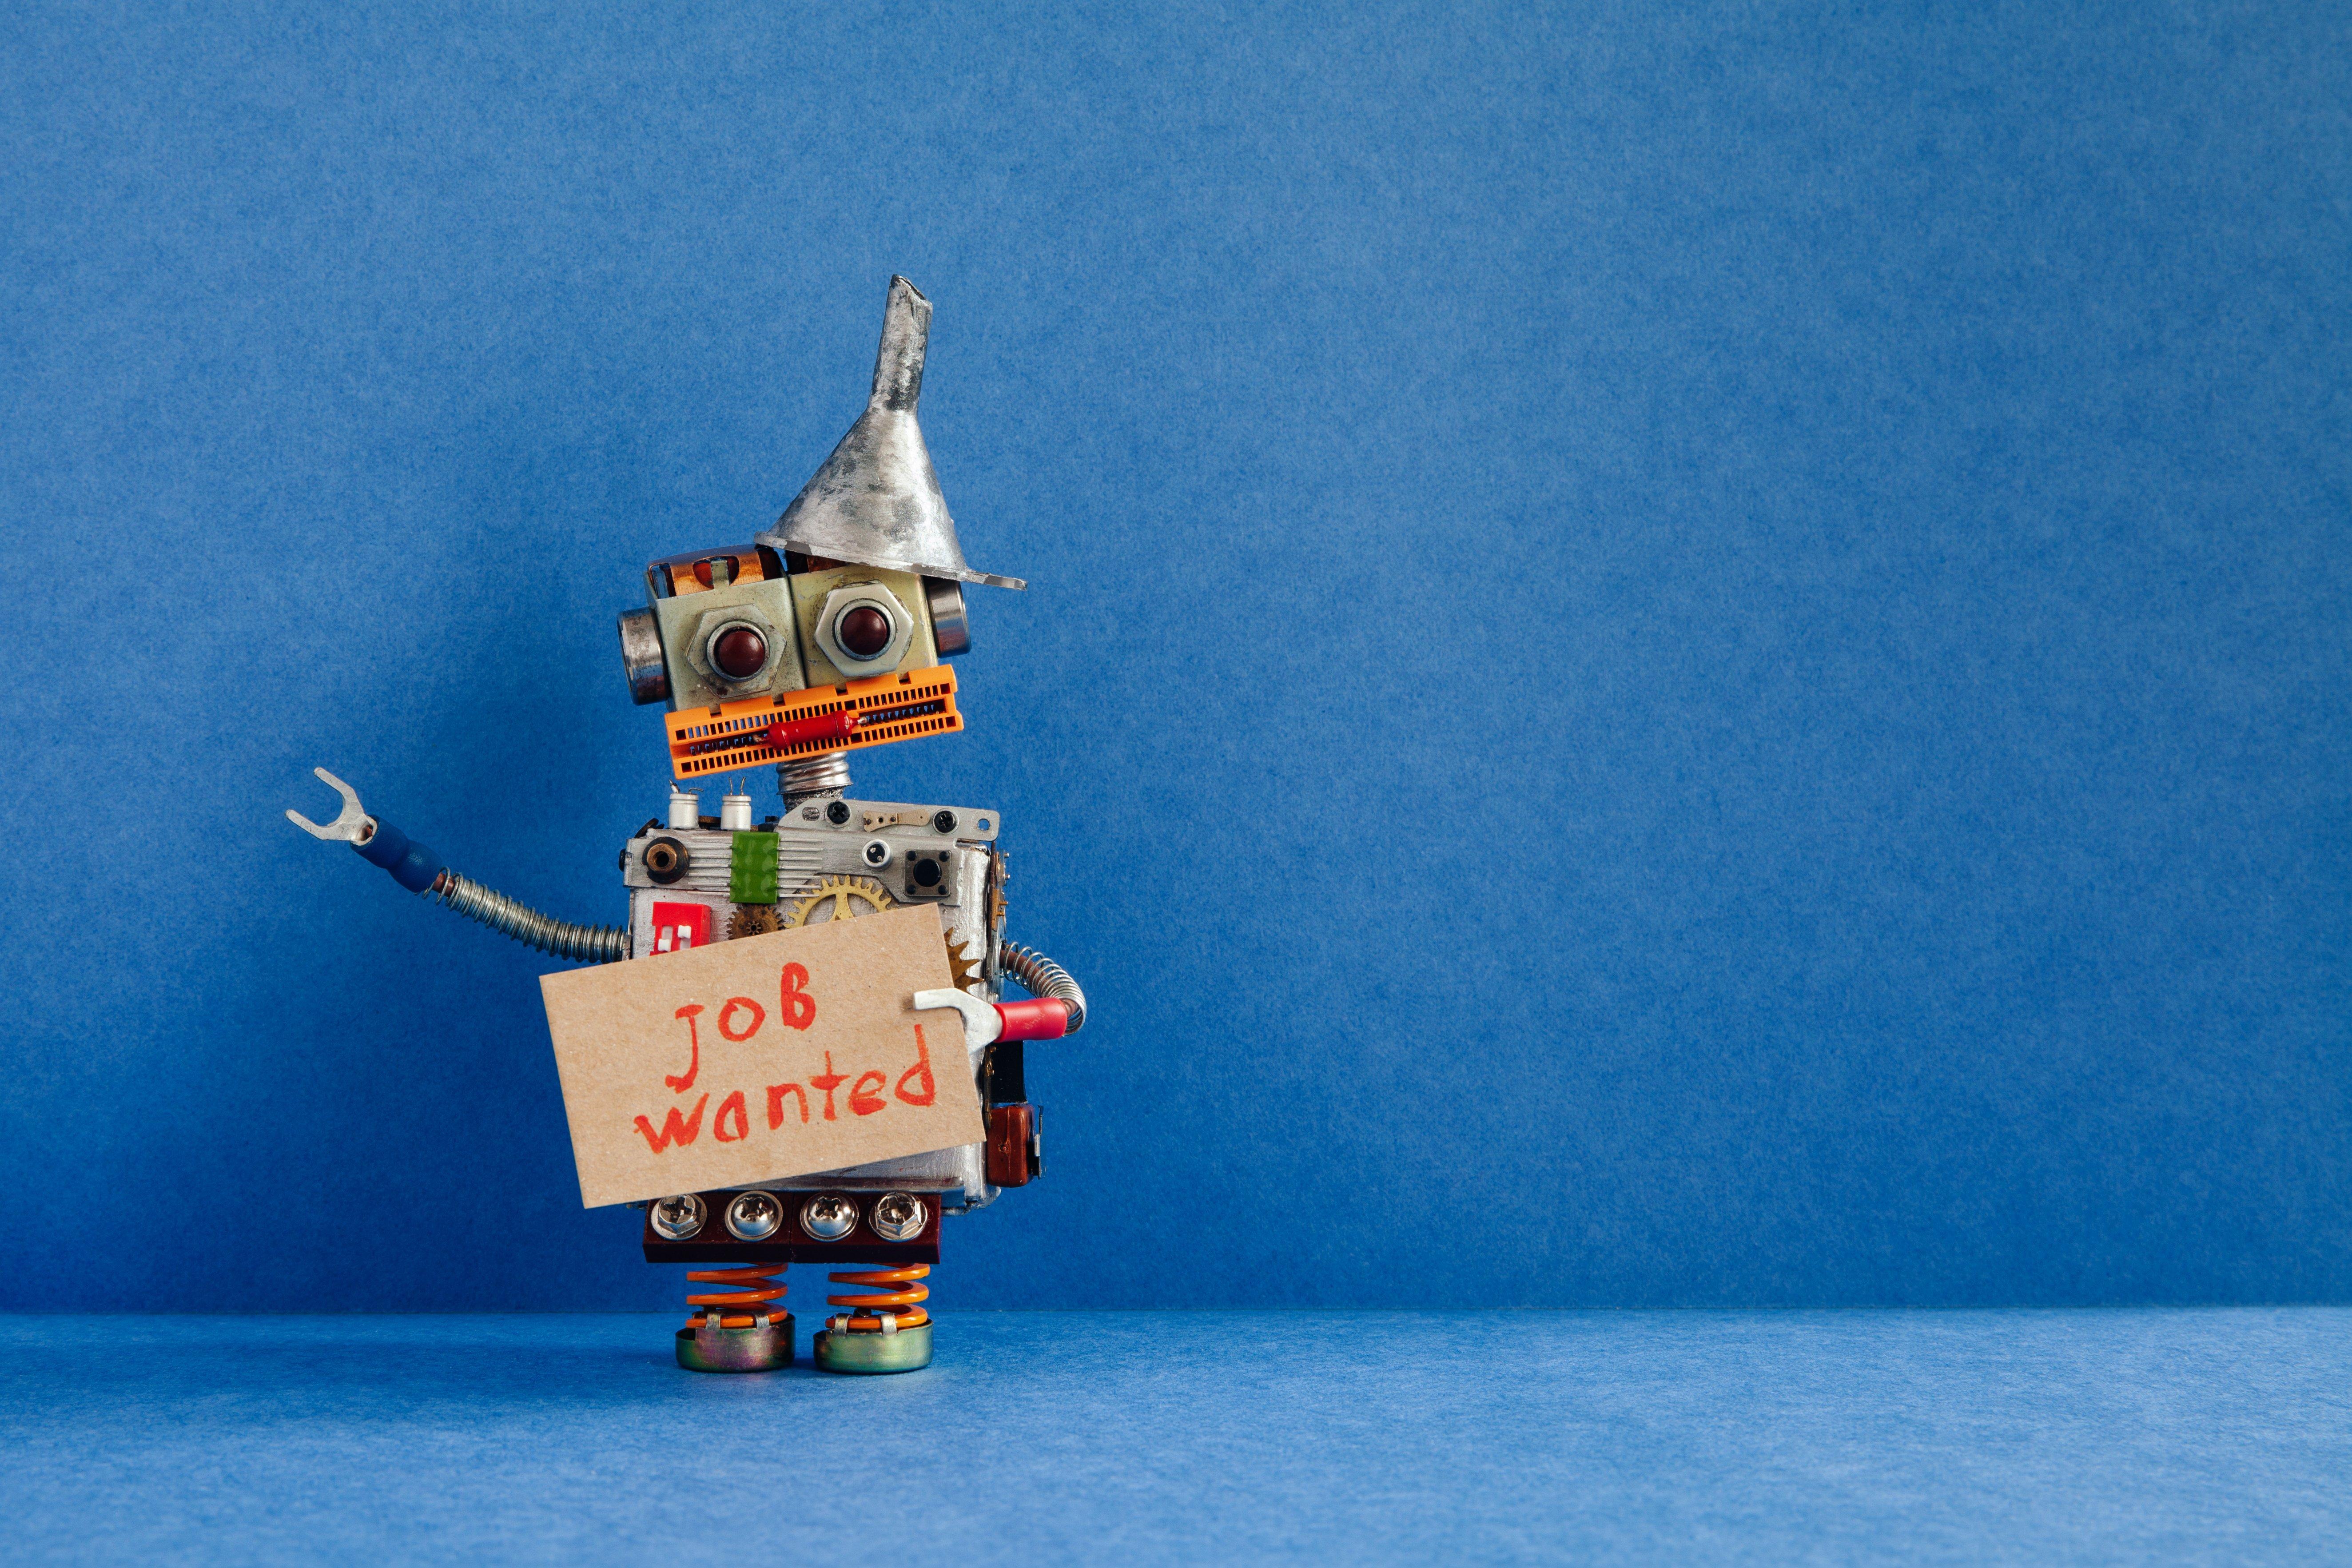 job-search-concept-robot-wants-to-get-a-job-QFEJMH5